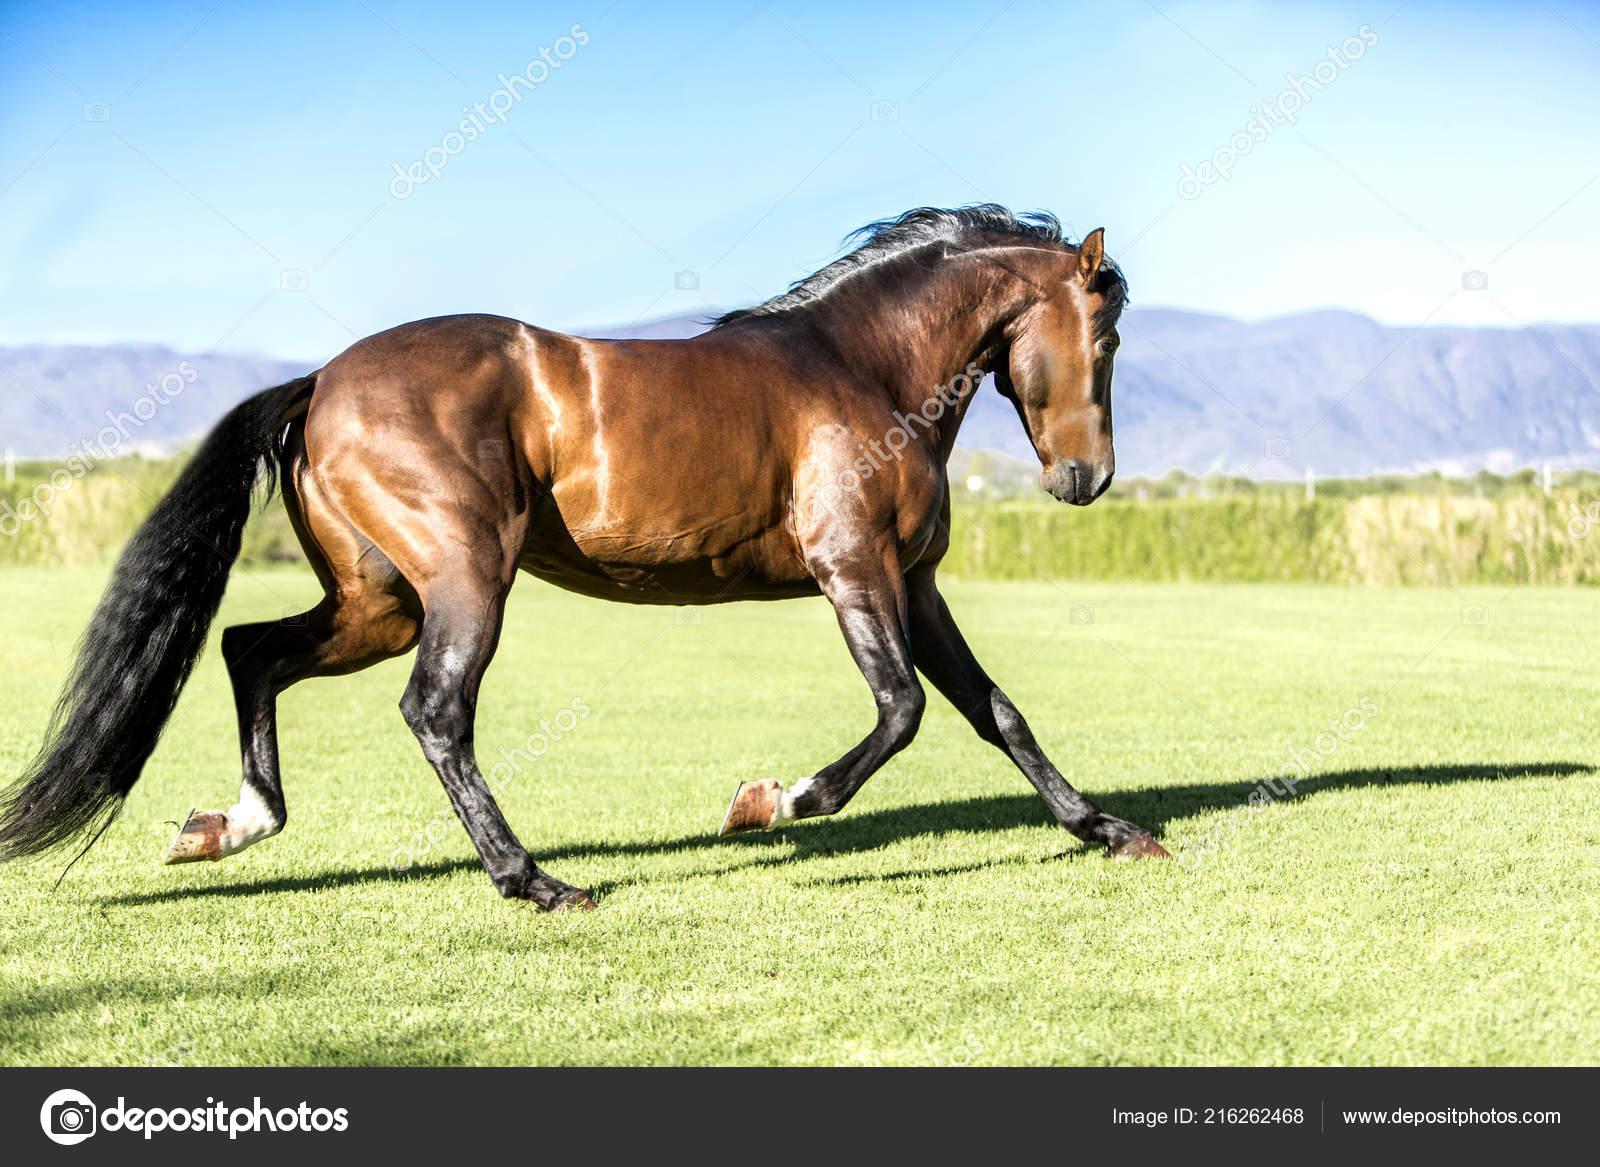 Thoroughbred Wild Horse Running Free Field Stock Photo